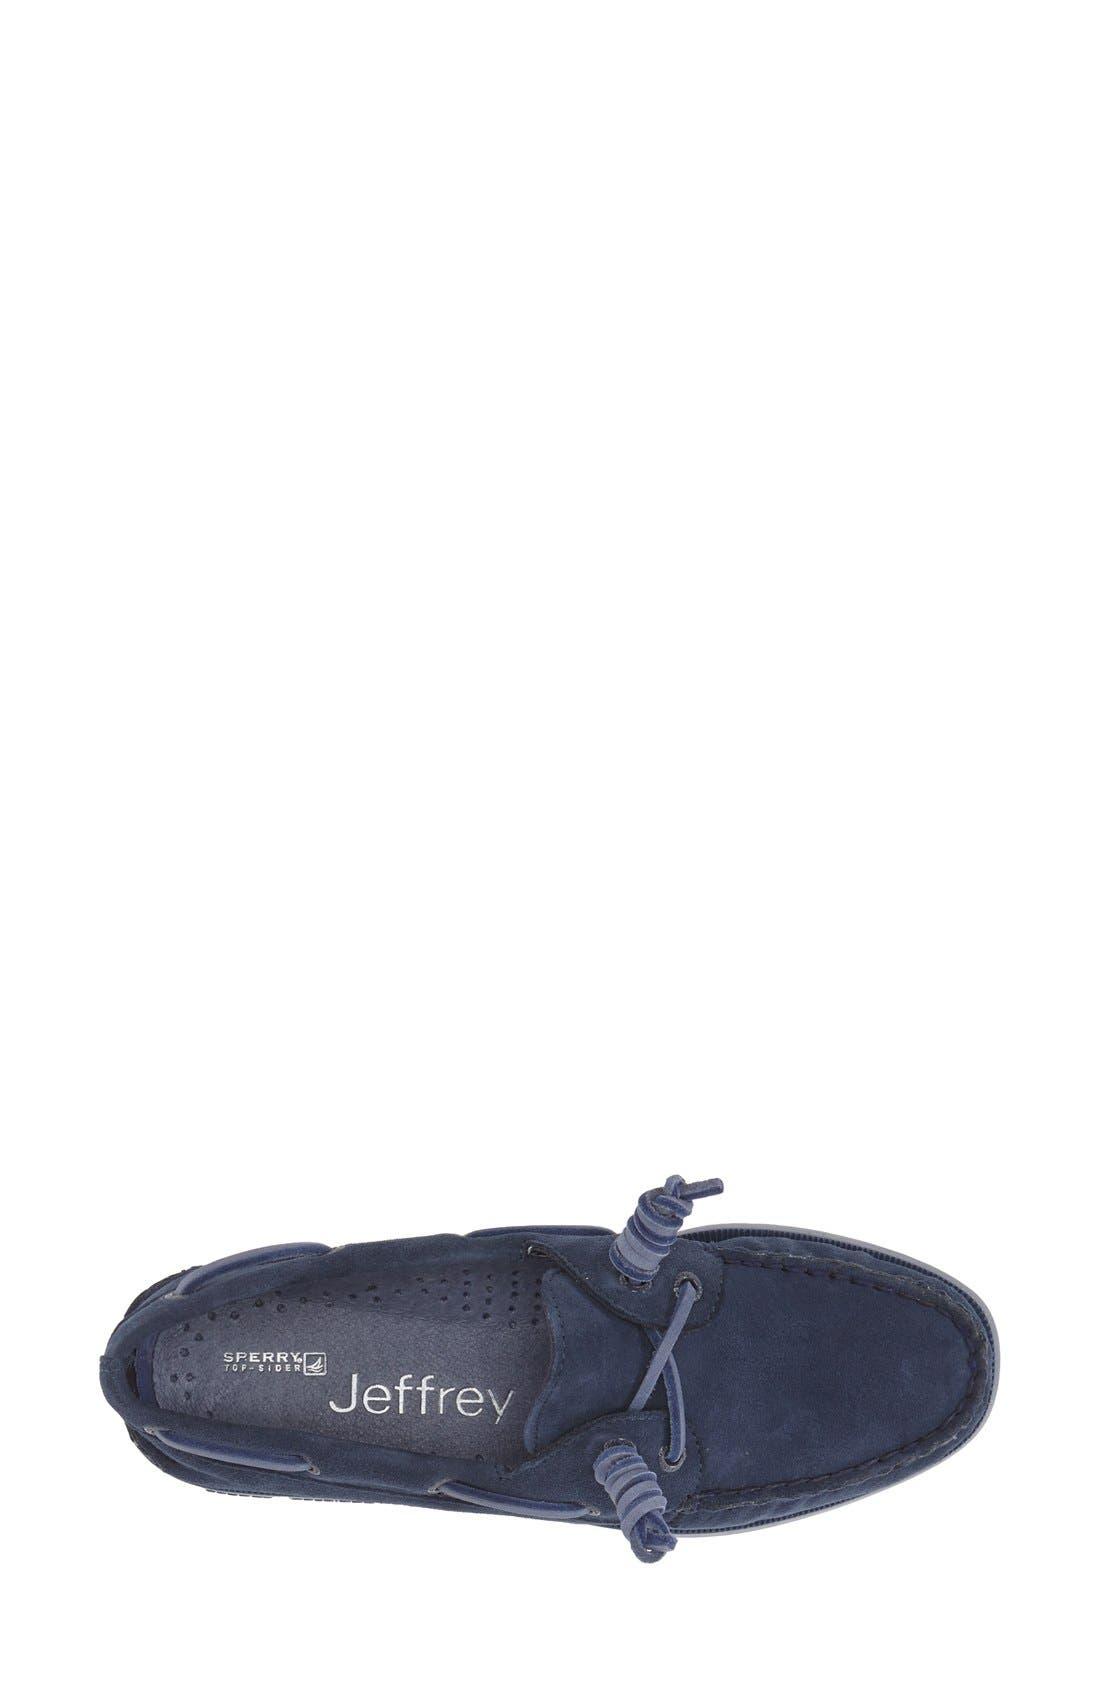 Alternate Image 3  - Sperry 'Jeffrey' Boat Shoe